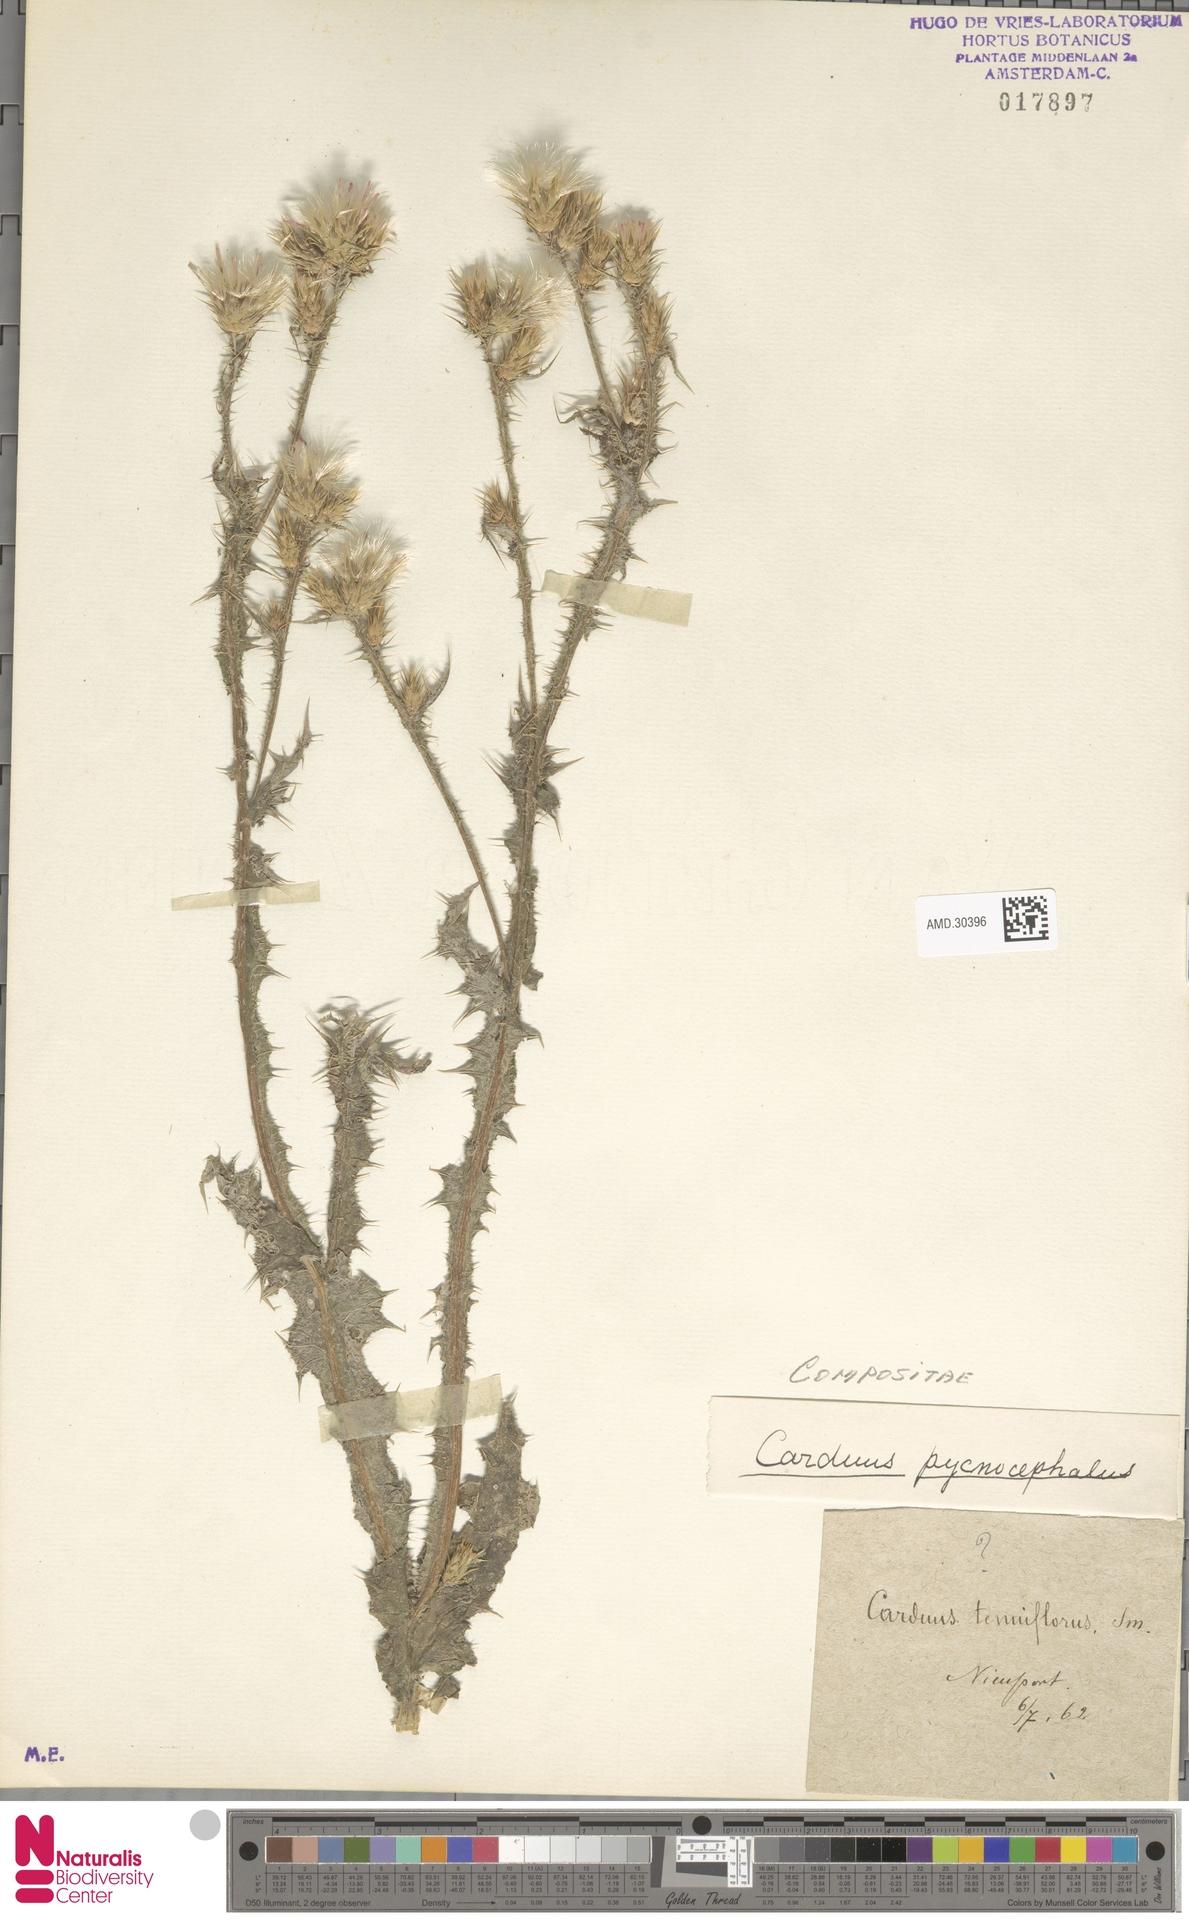 AMD.30396 | Carduus pycnocephalus L.